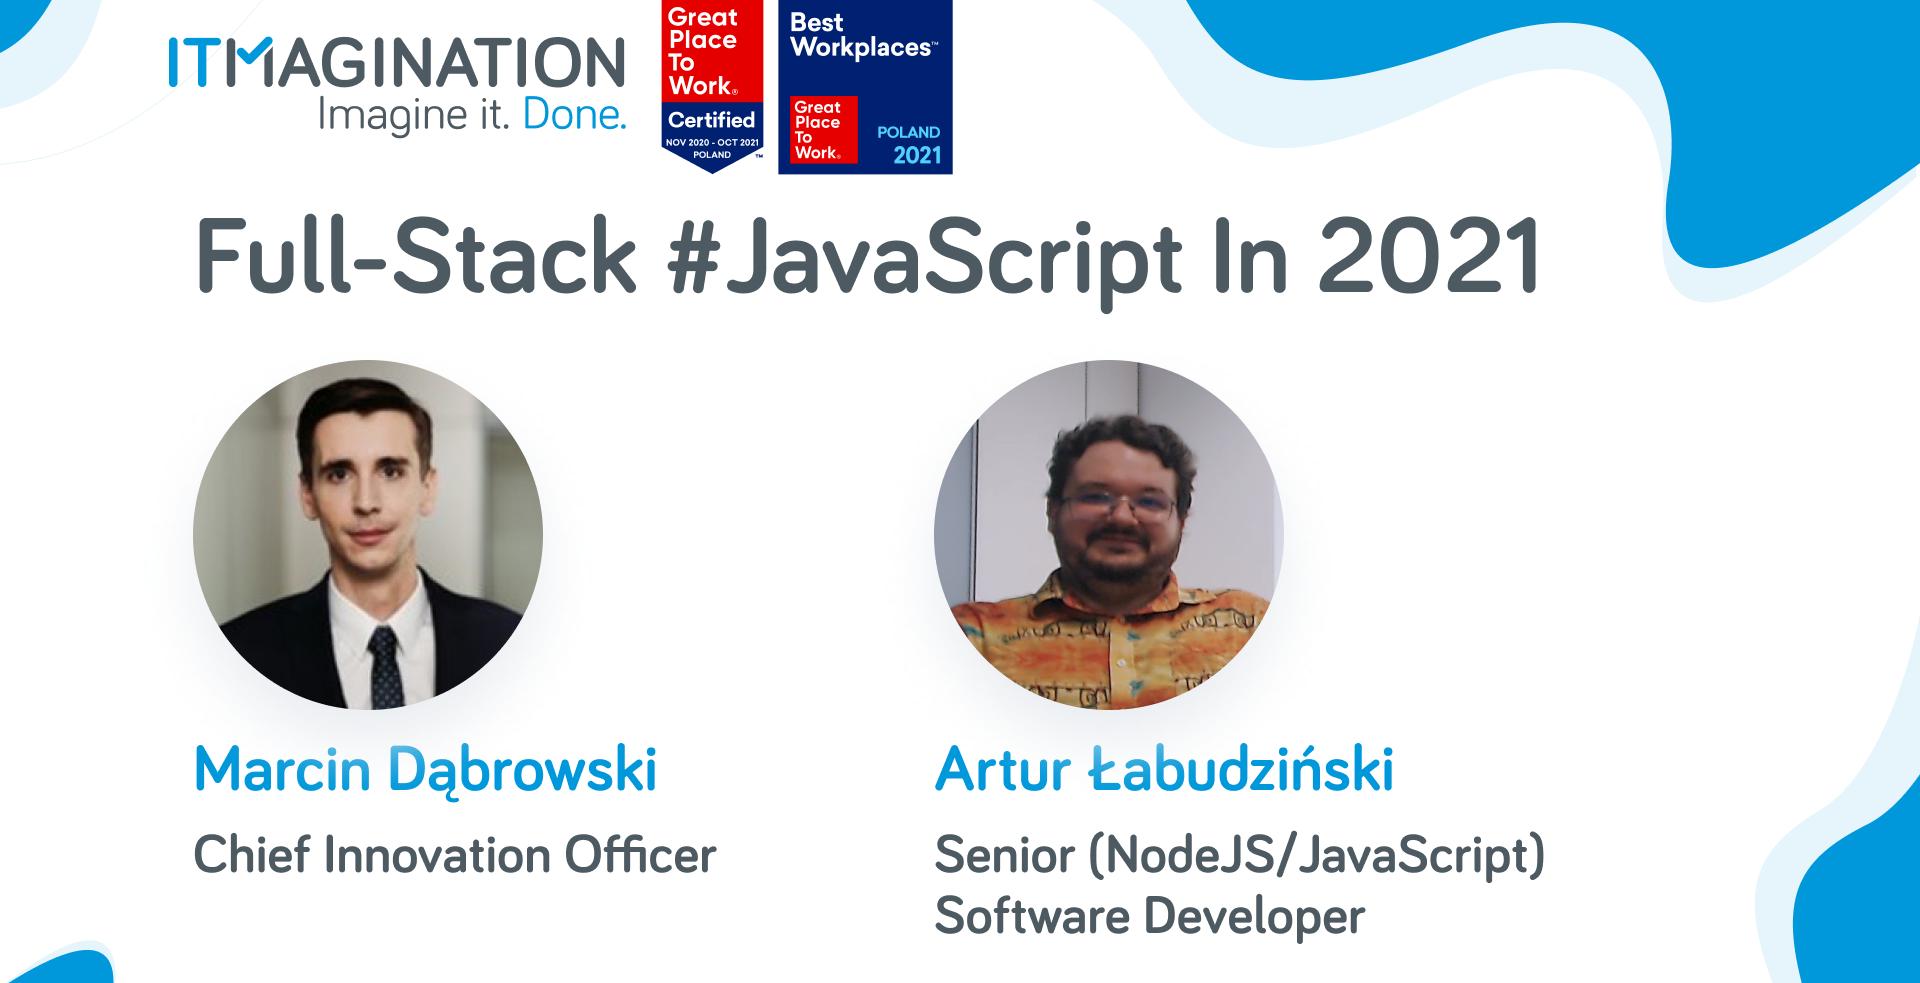 Plusy i Minusy Full-Stack JavaScript w 2021 Roku [VIDEO]